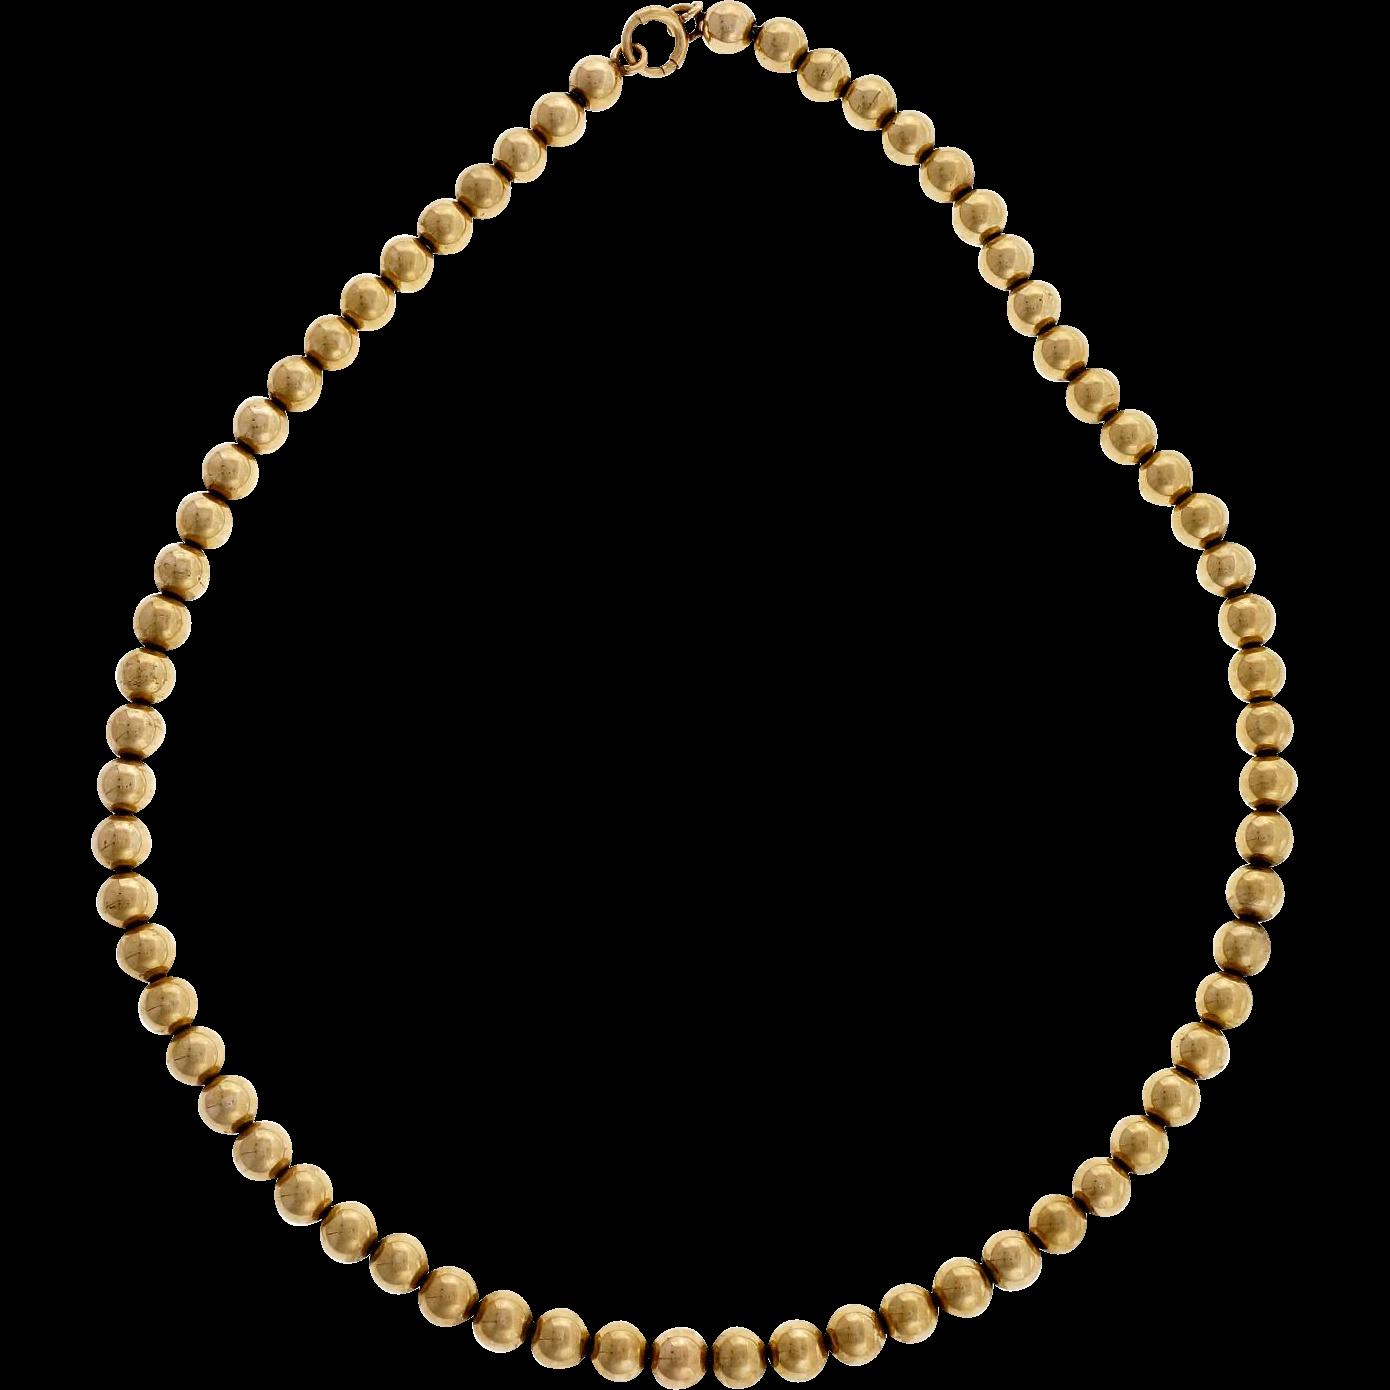 14 Karat Yellow Gold Bead Necklace